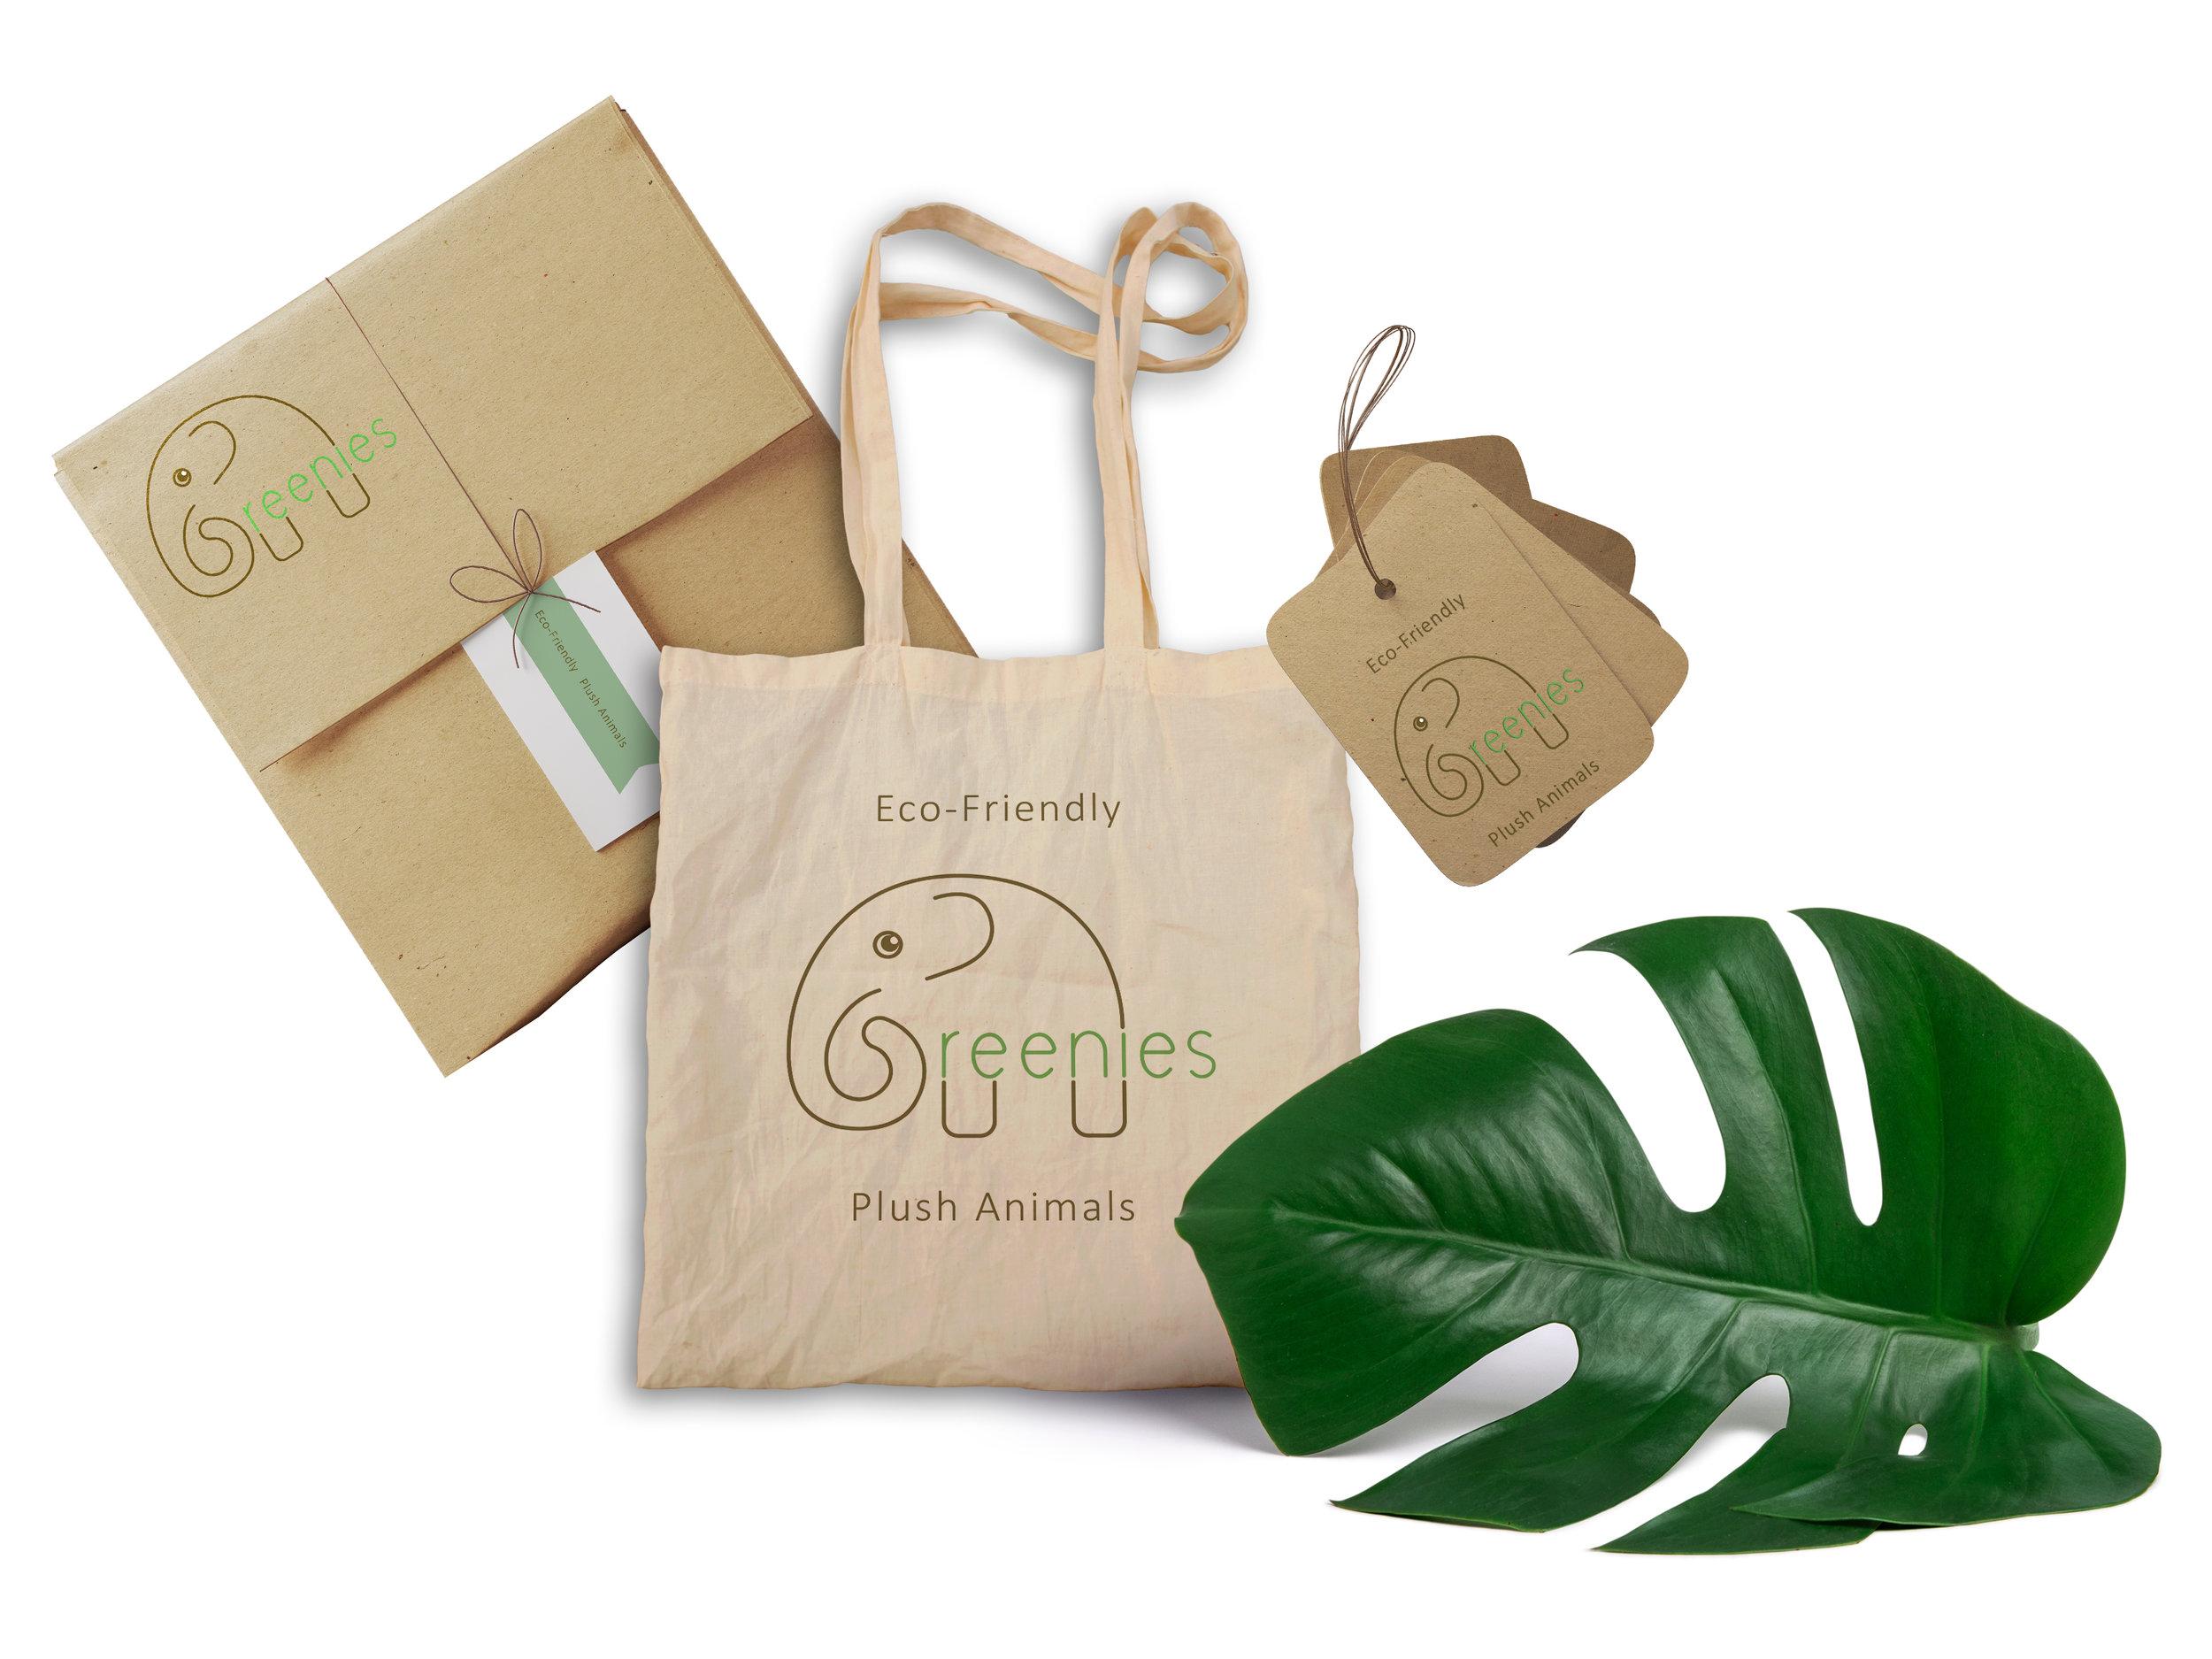 Greenies Eco-Friendly Plush Animals Branding